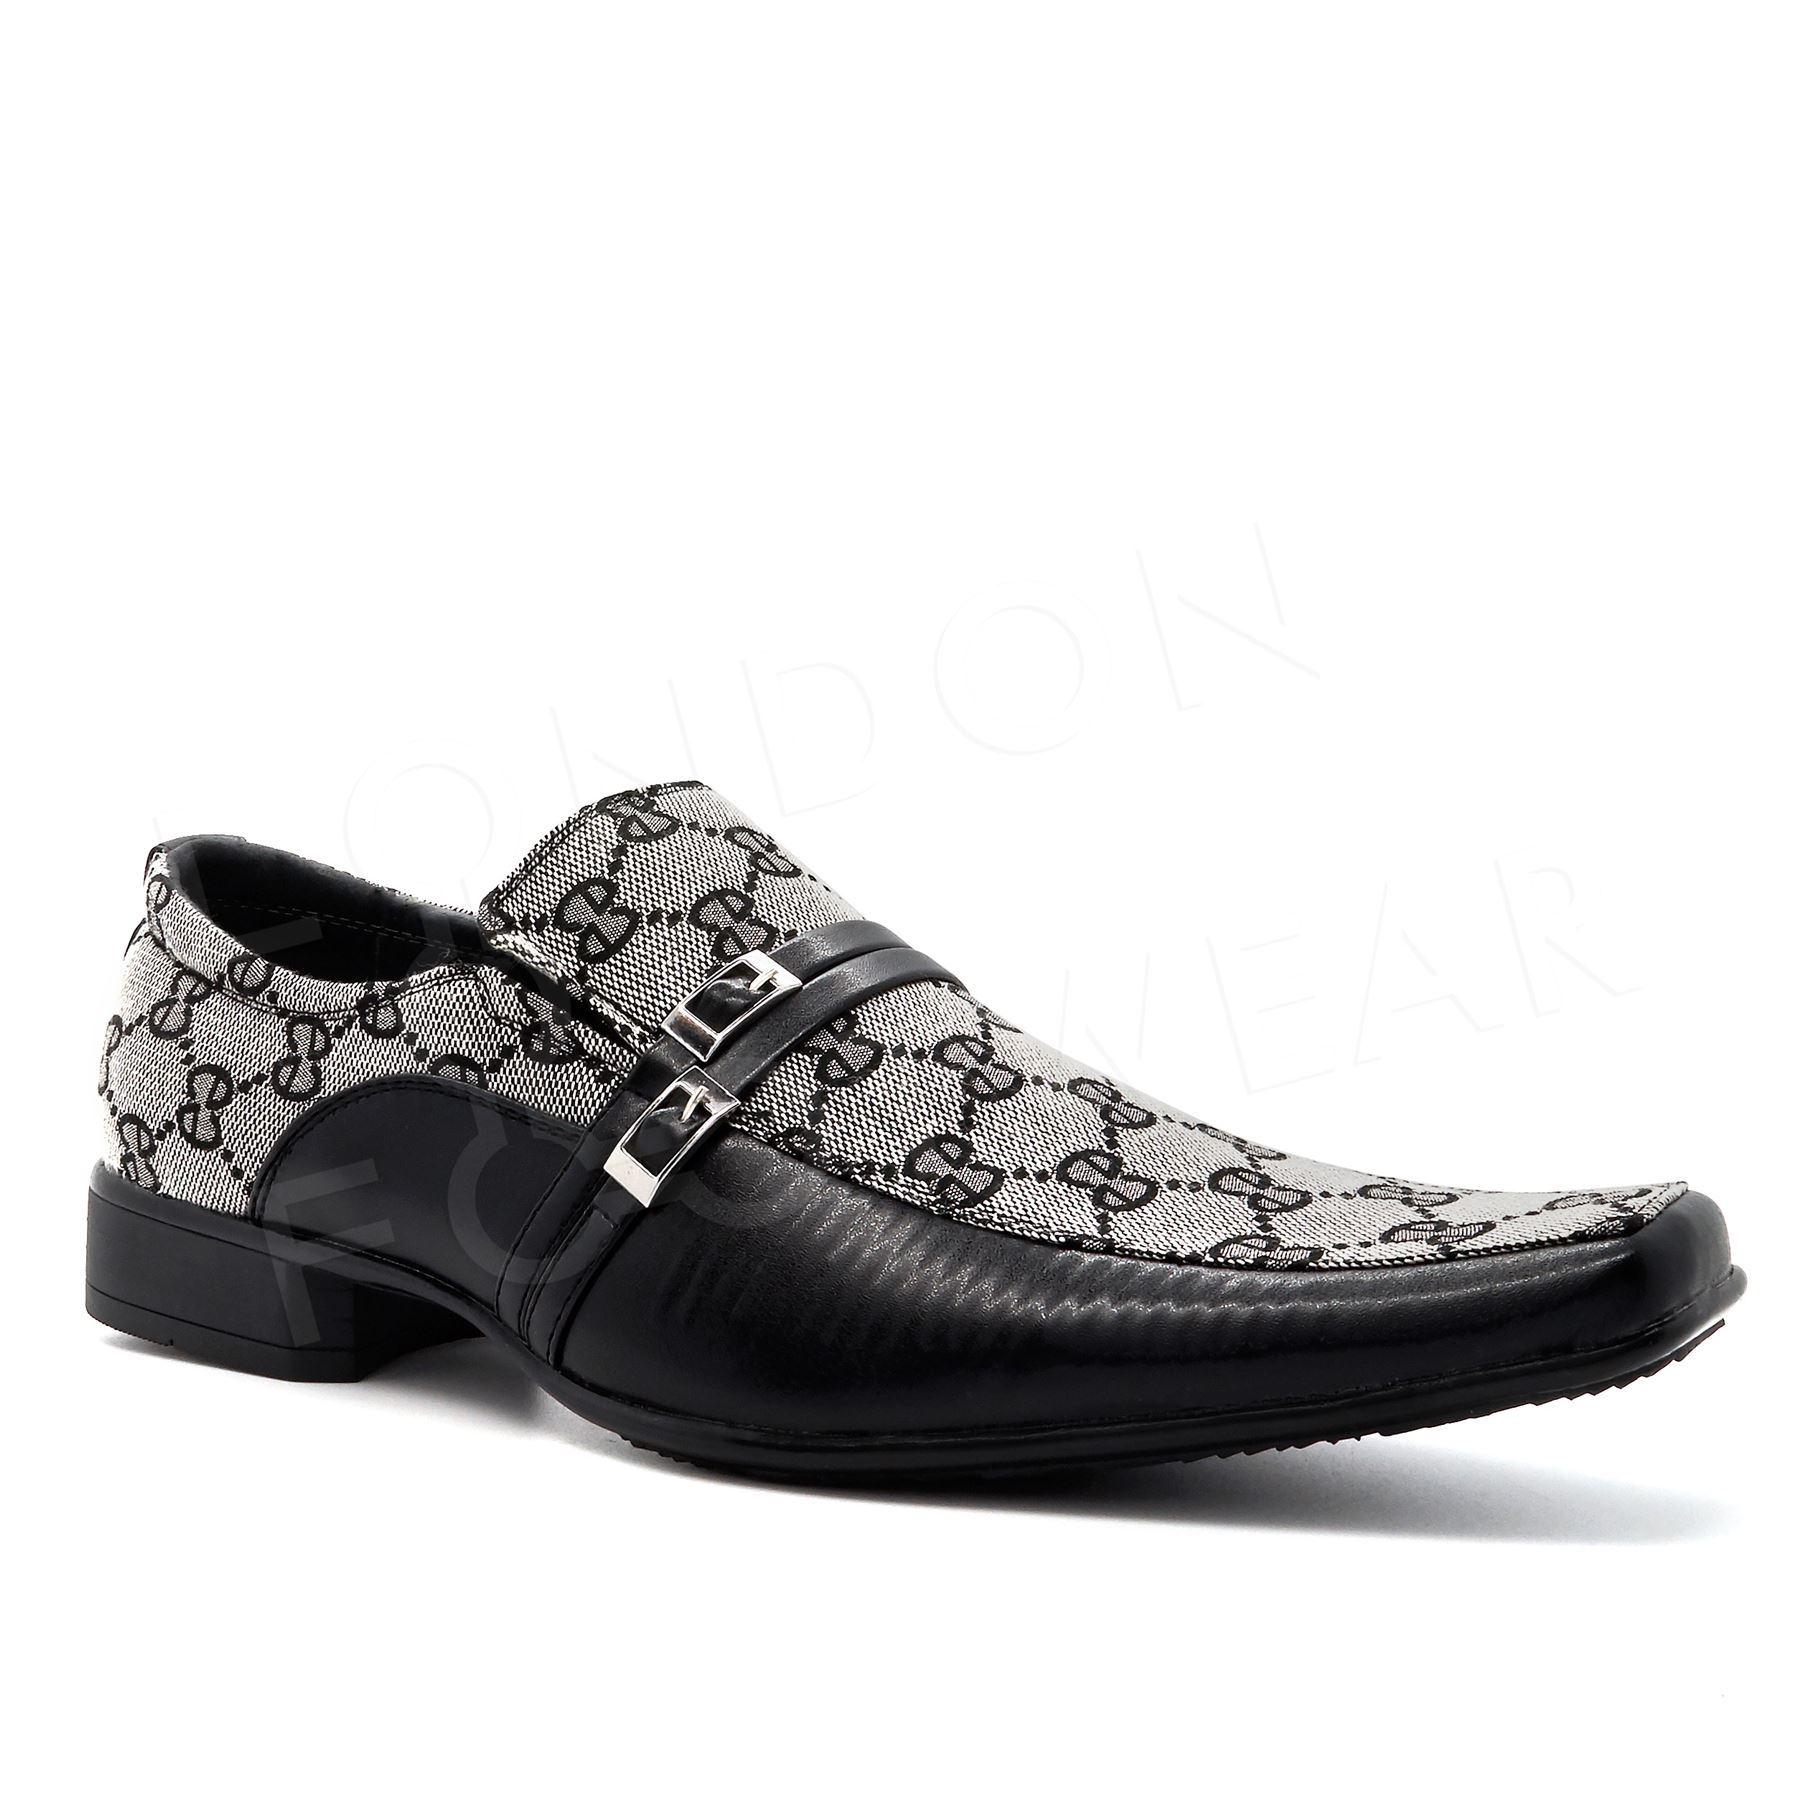 Black Shoes Mens New Italian Smart Party Wedding Dress